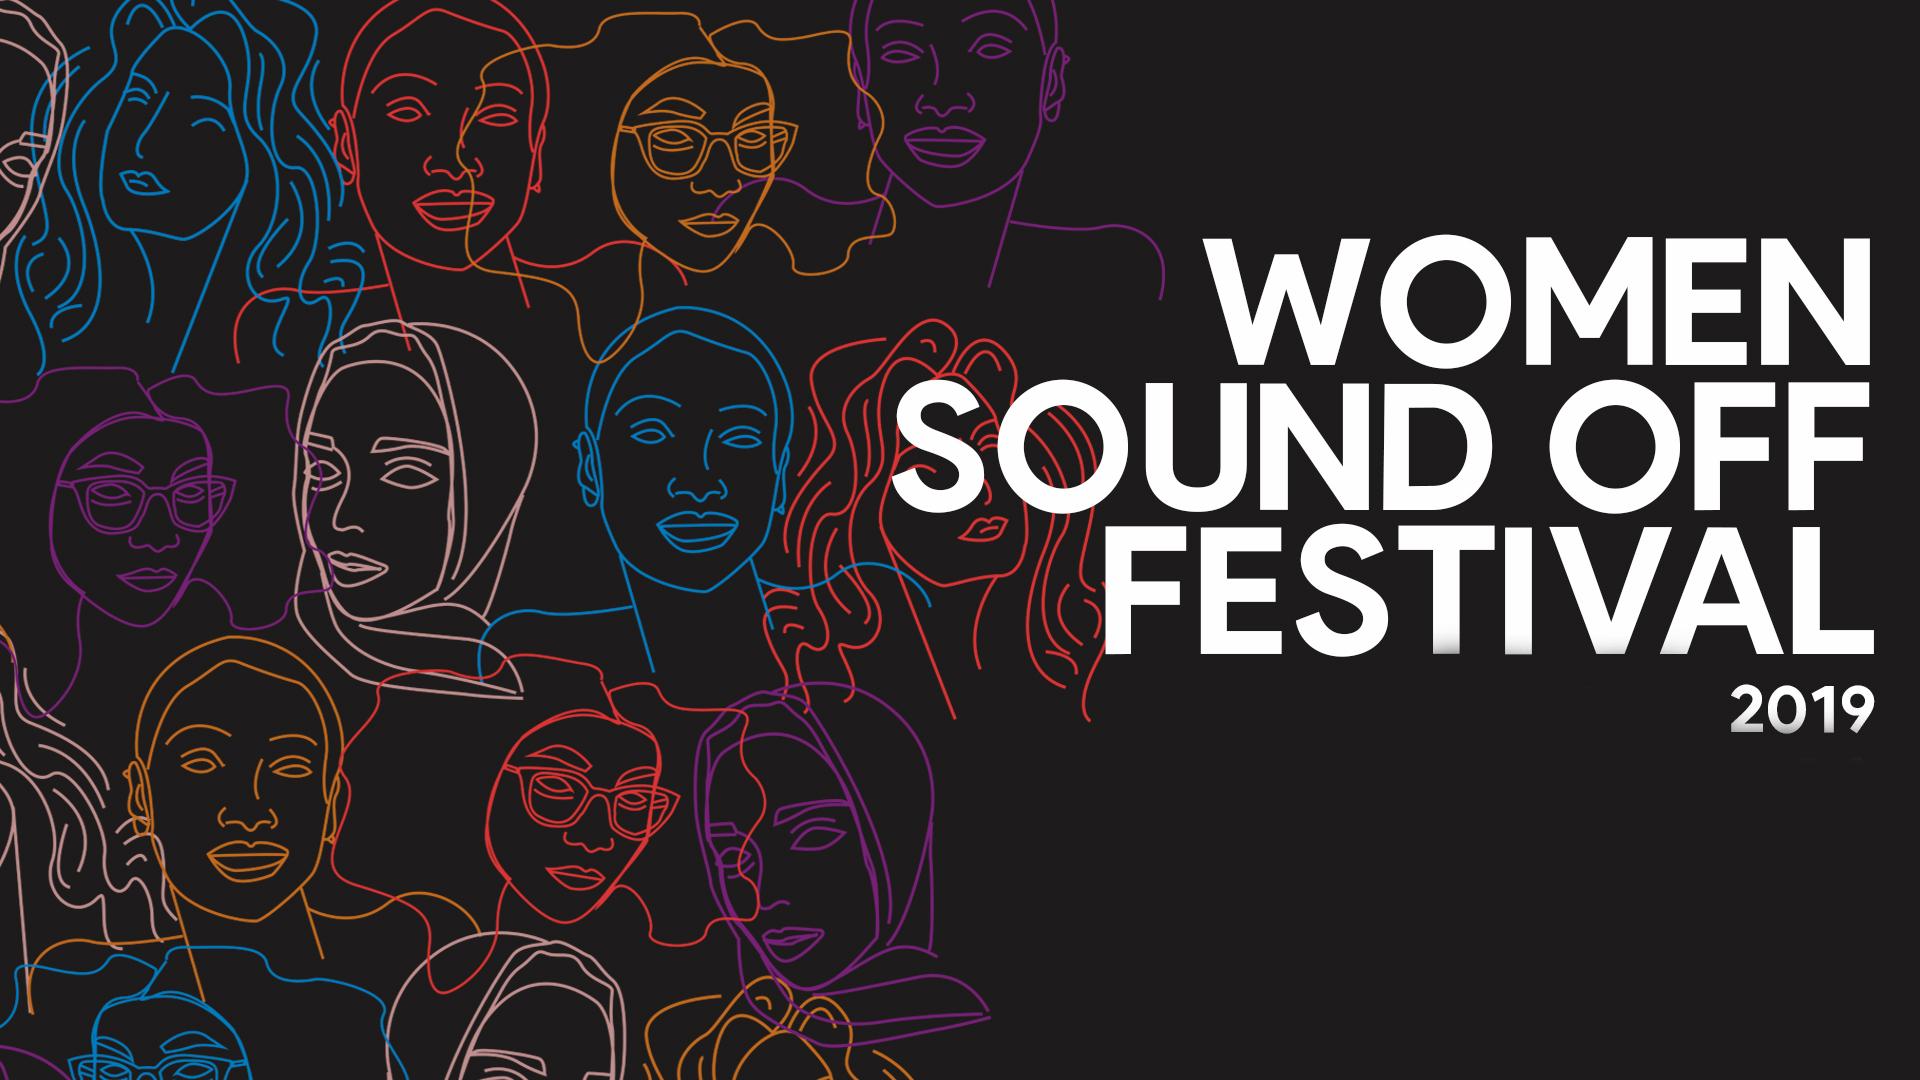 women sound off festival.jpg